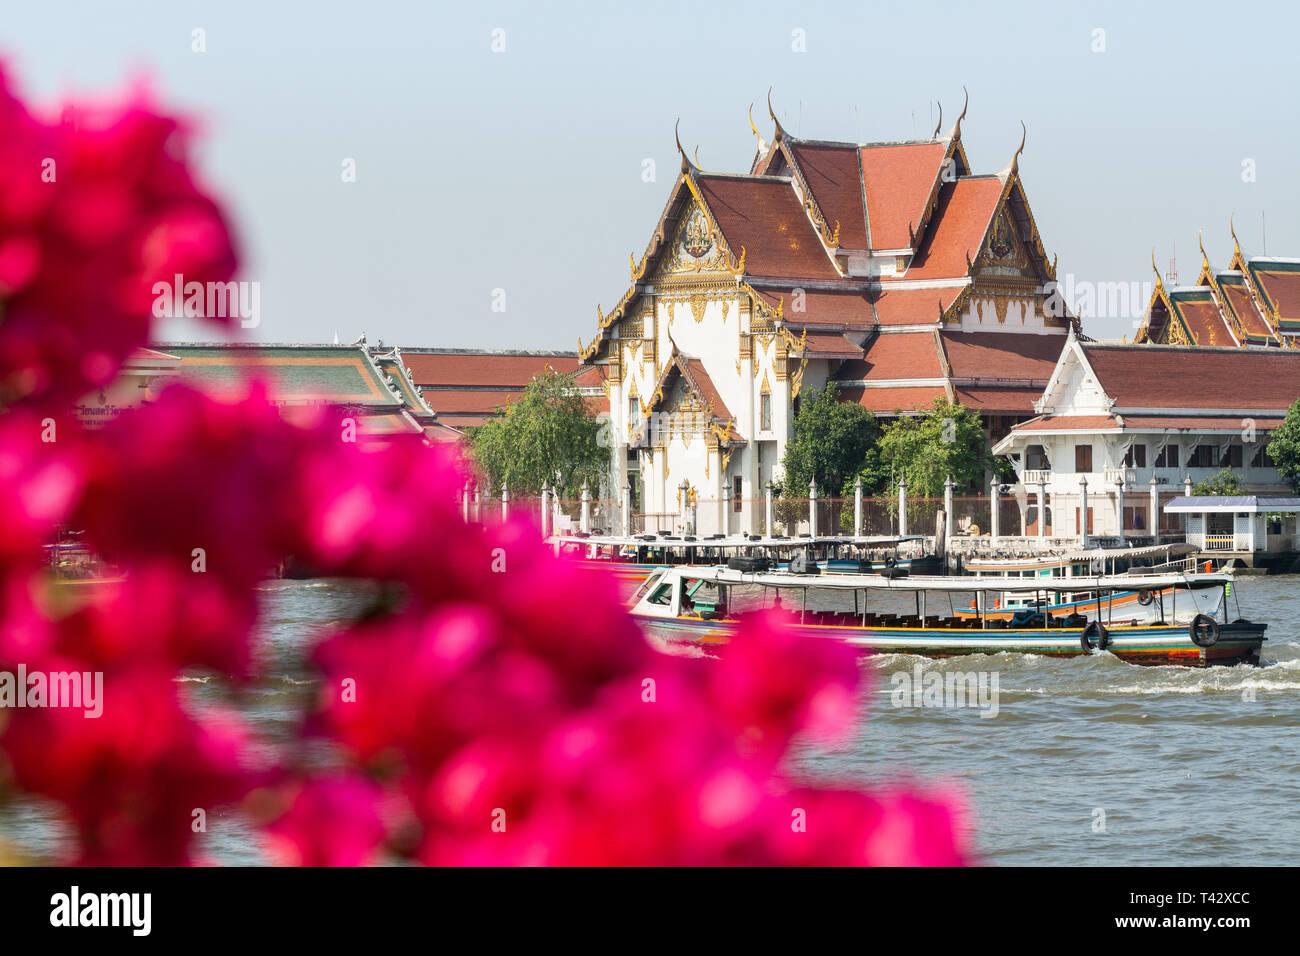 View over Wat Rakang Kositaram Woramahawihan temple and Chao Phraya river through flowers in Bangkok, Thailand. Blurry foreground, shallow depth of fi - Stock Image